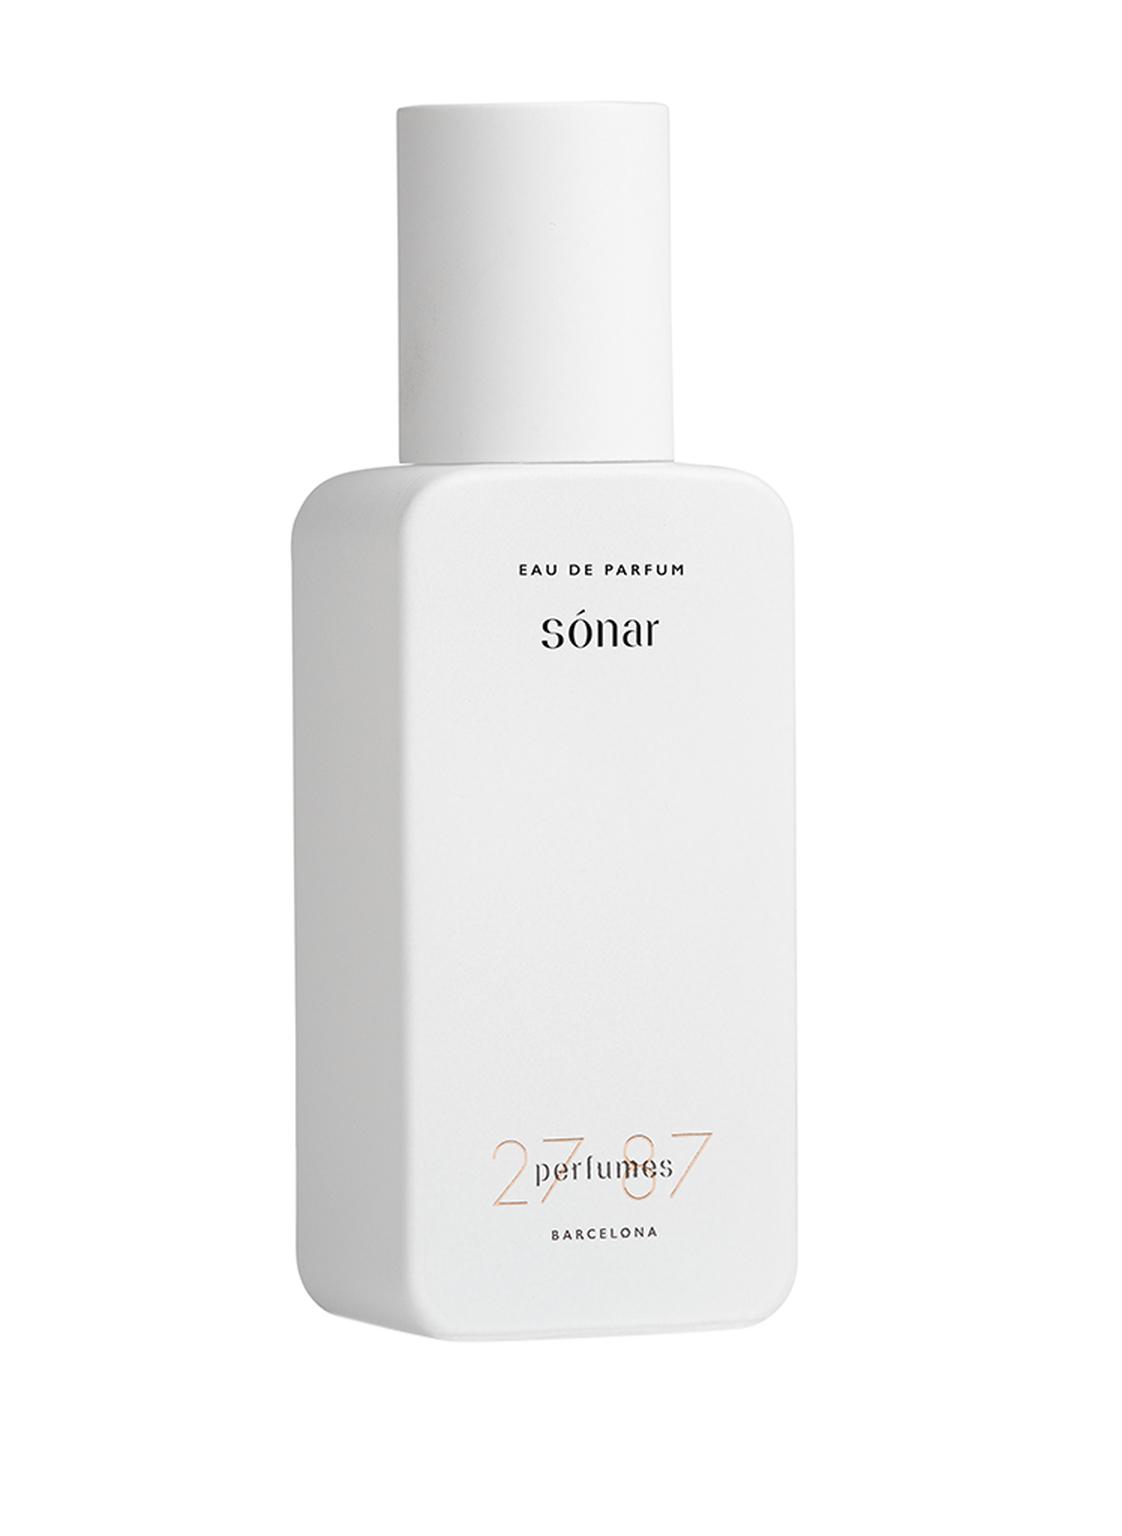 Image of 27 87 Perfumes Sónar Eau de Parfum 27 ml